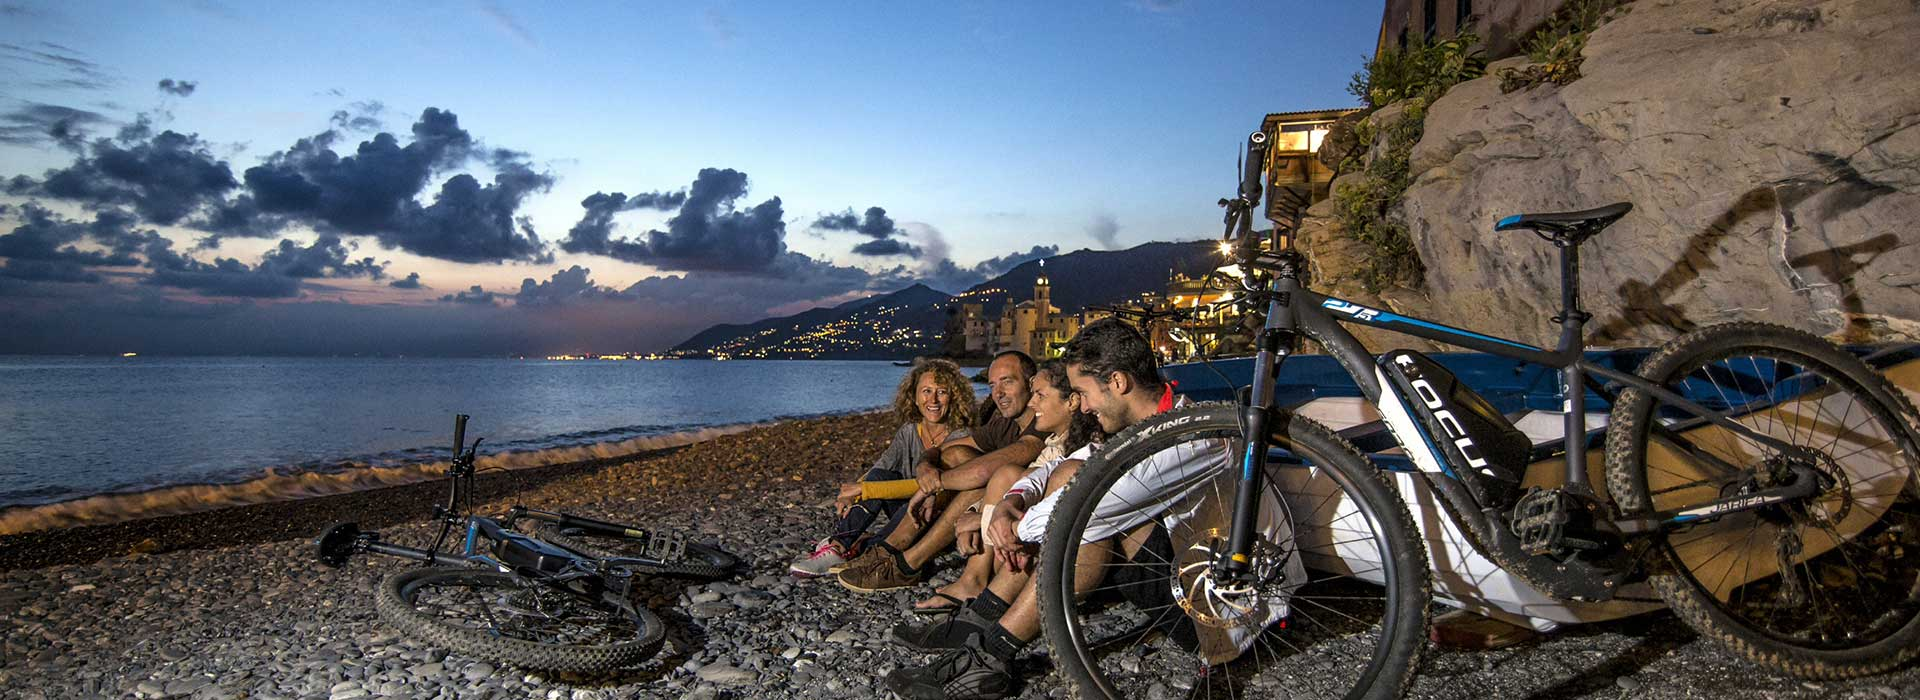 ebike 5 terre liguria italy hiking trekking portofino levanto e-bike bike francesco carocci tours